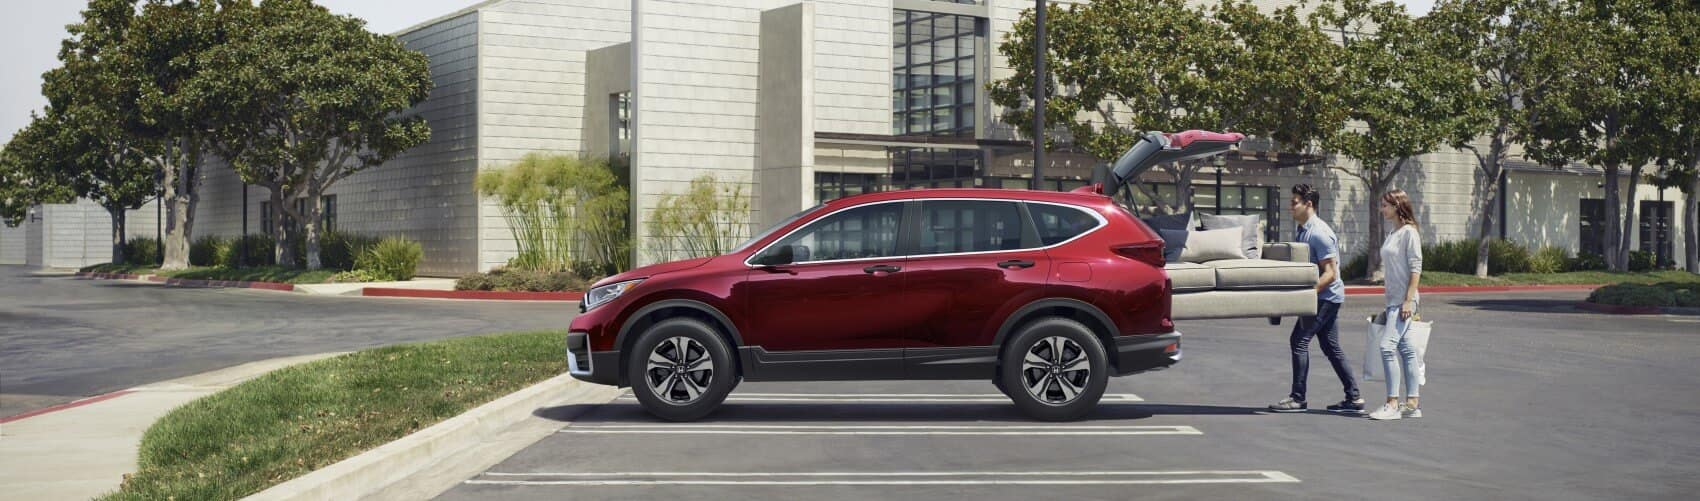 Honda CR-V for Sale near Mechanicsburg PA